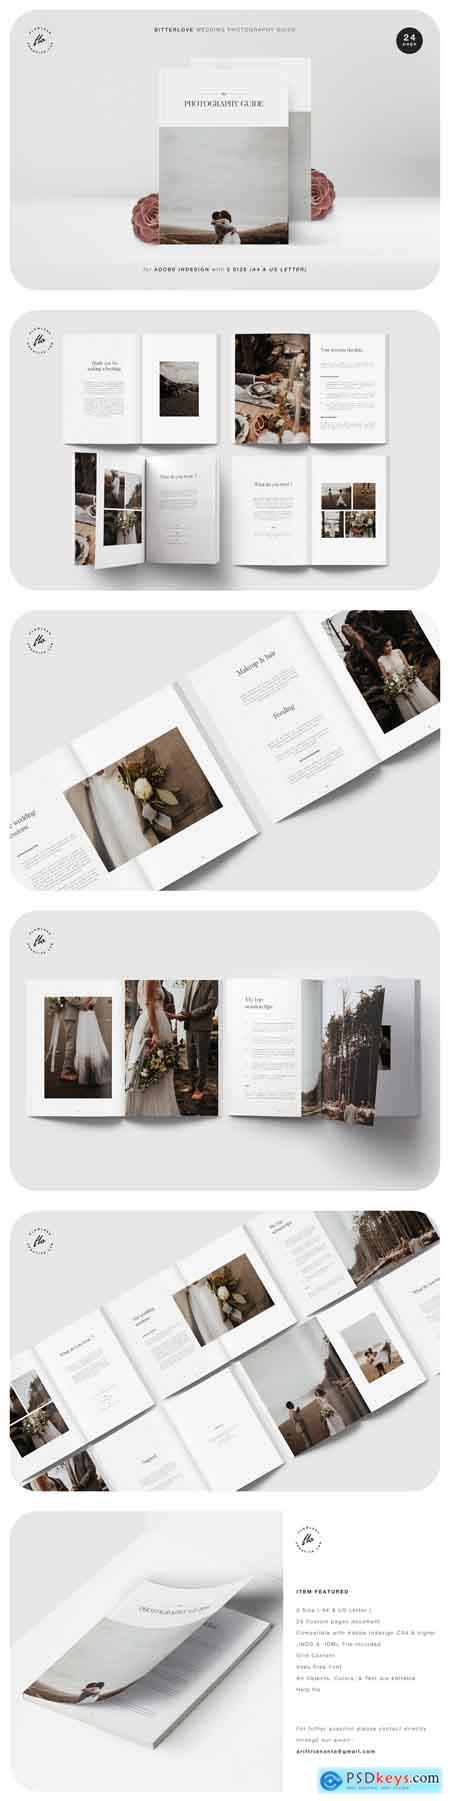 Creativemarket BITTERLOVE Wedding Photography Guide